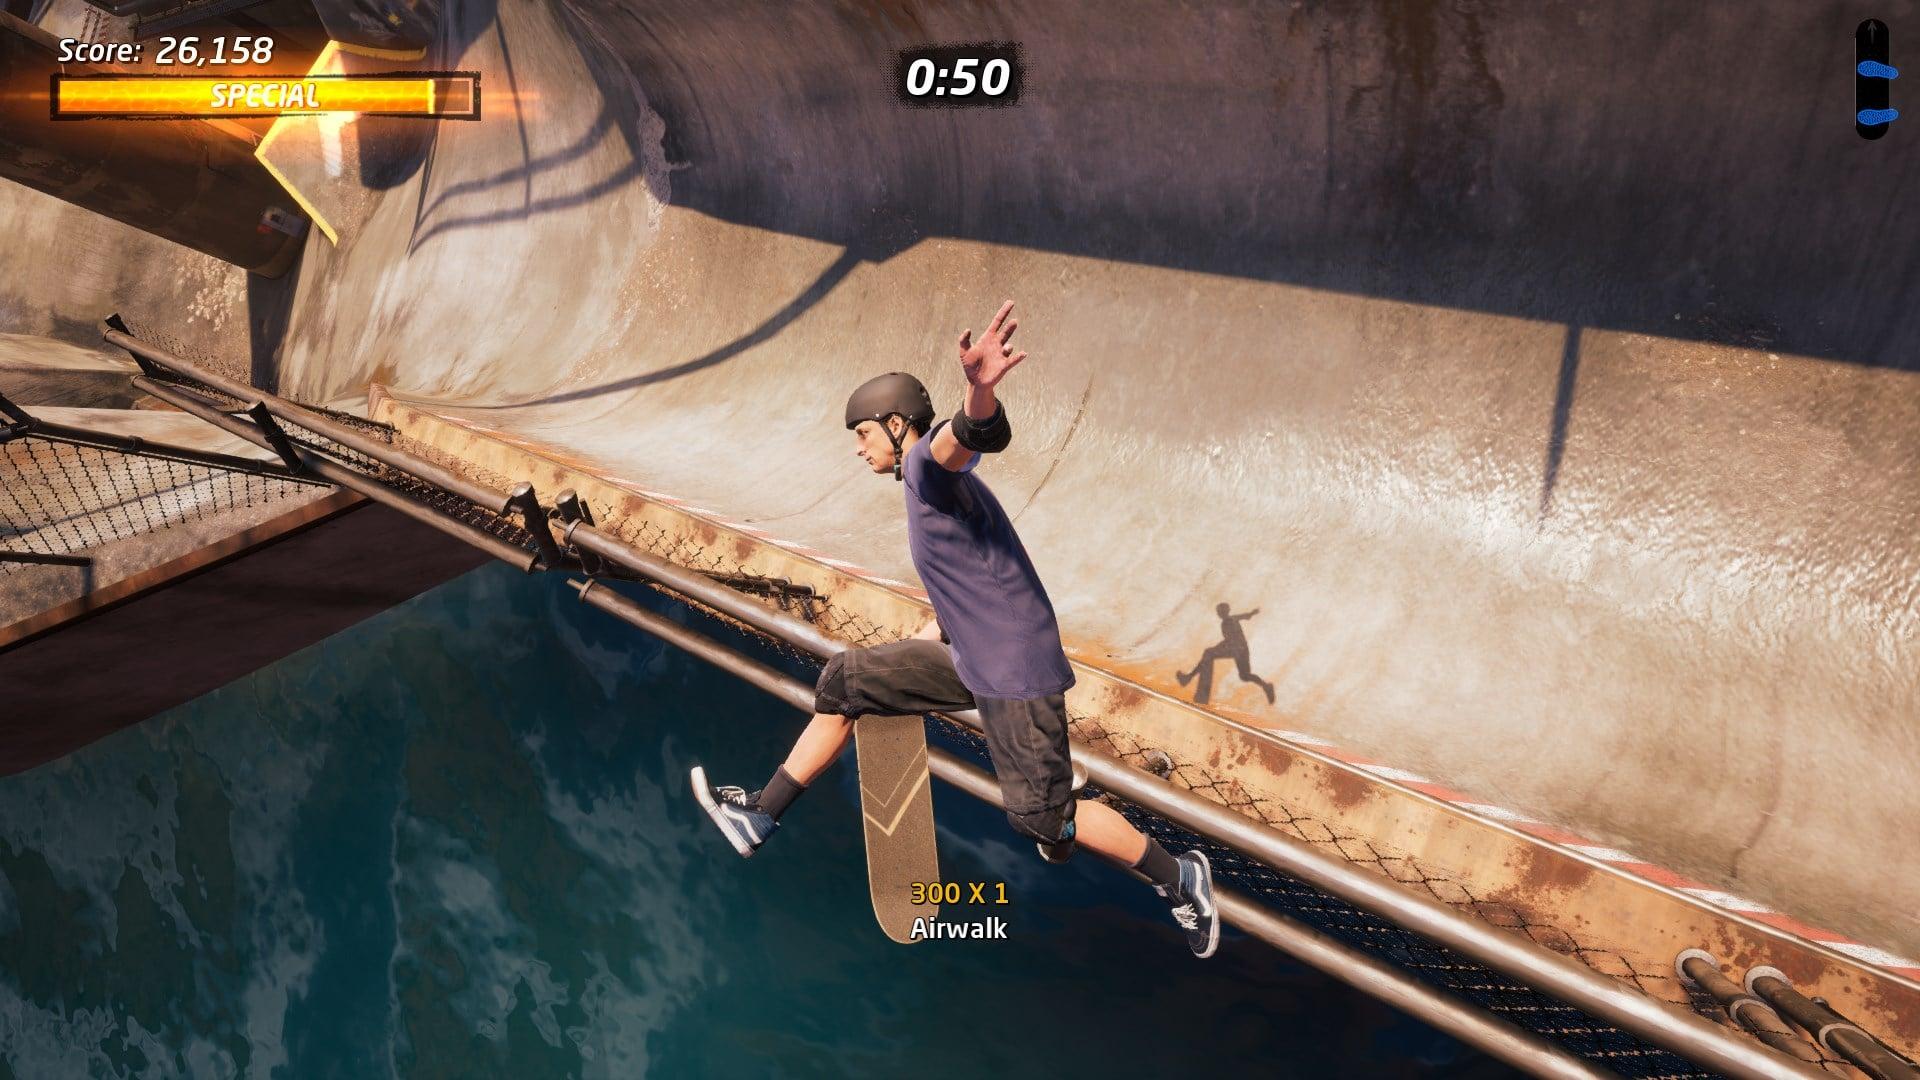 Tony Hawk air walking over a half pipe